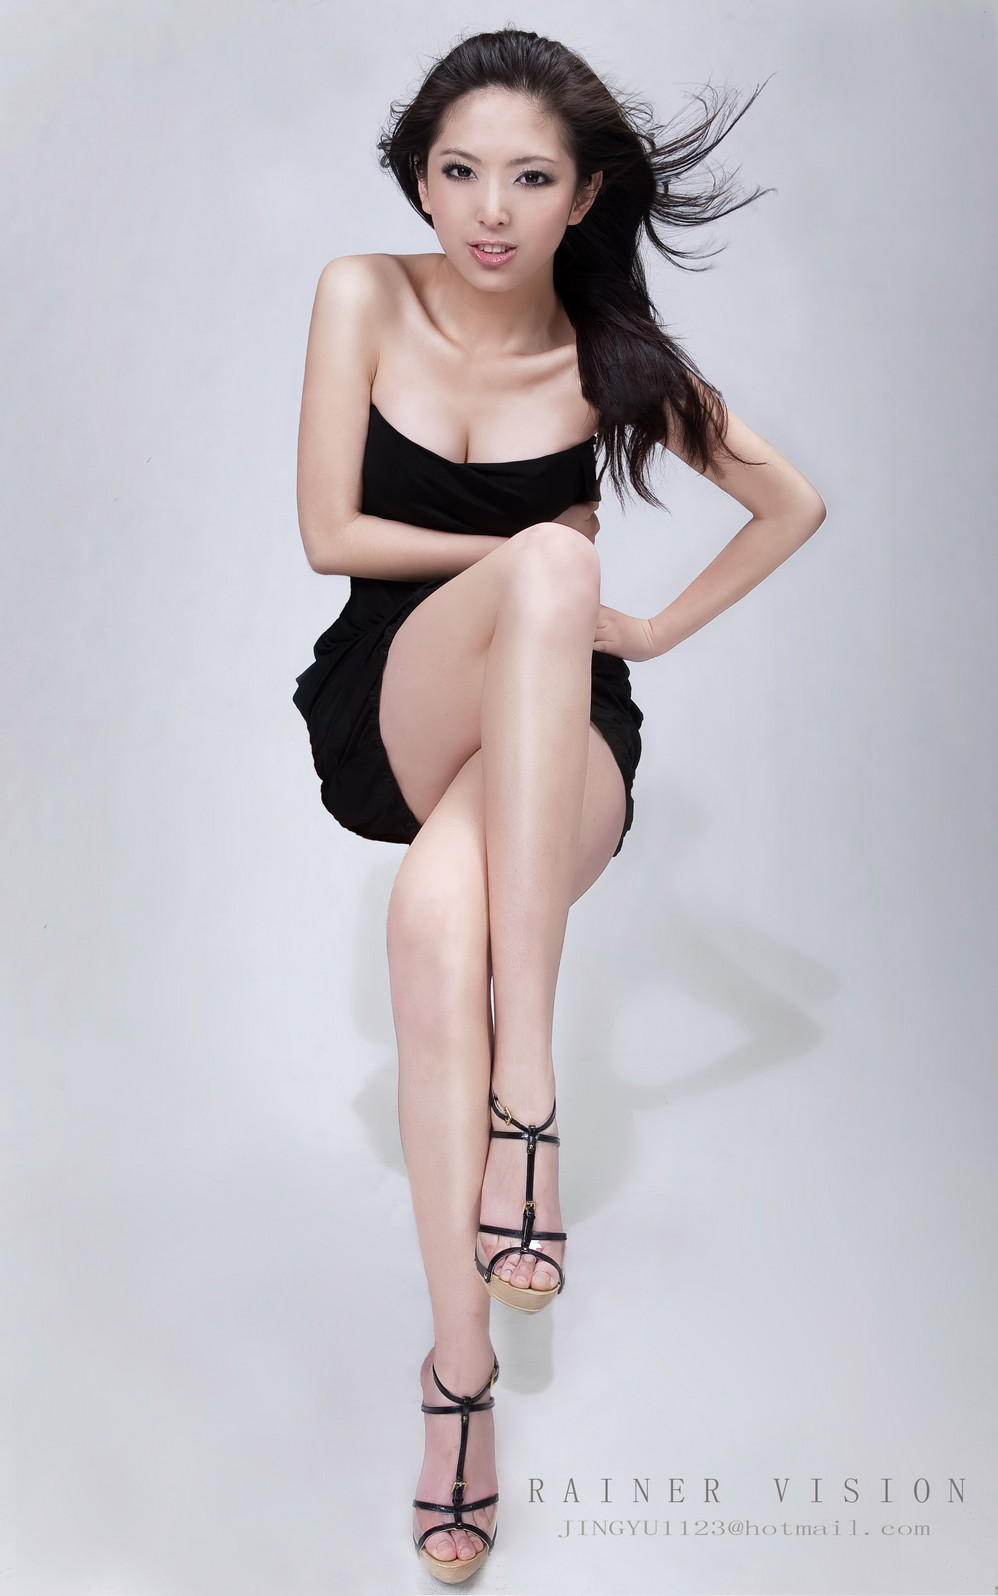 陈菲zara chen